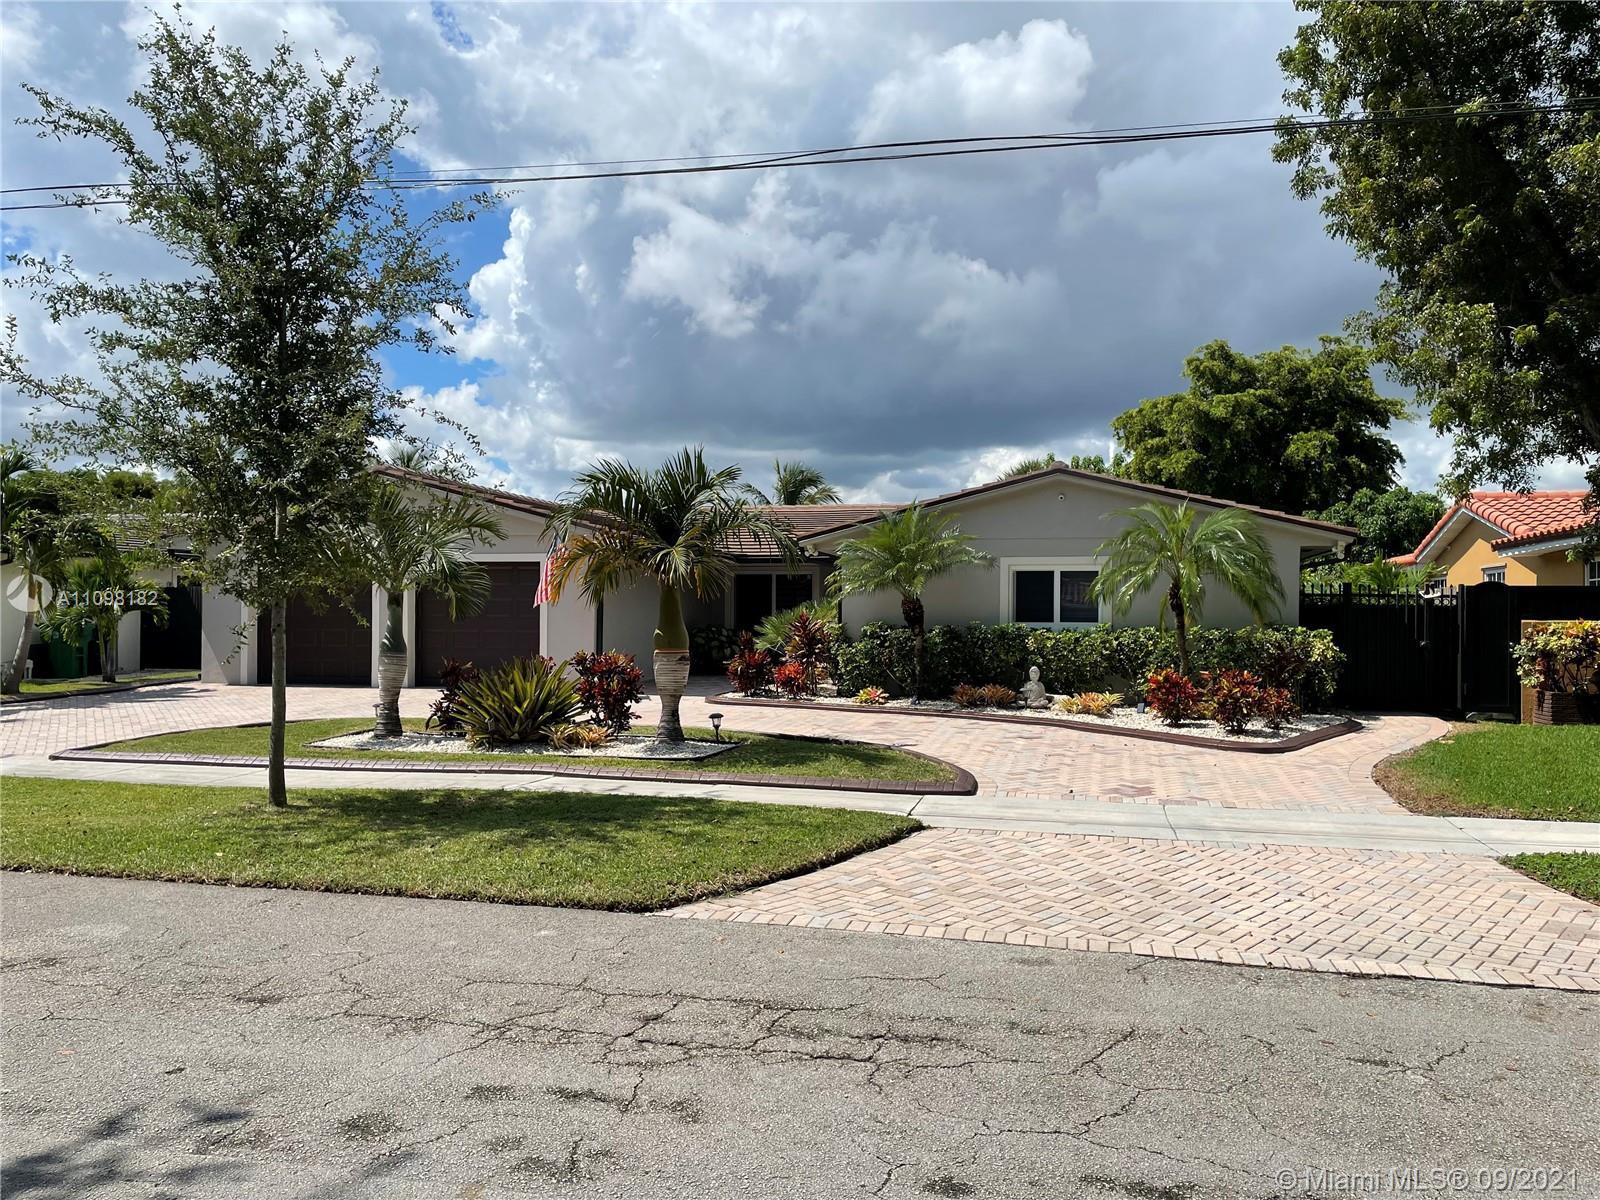 Single Family Home,For Sale,14500 Lake Crescent Pl, Miami Lakes, Florida 33014,Brickell,realty,broker,condos near me